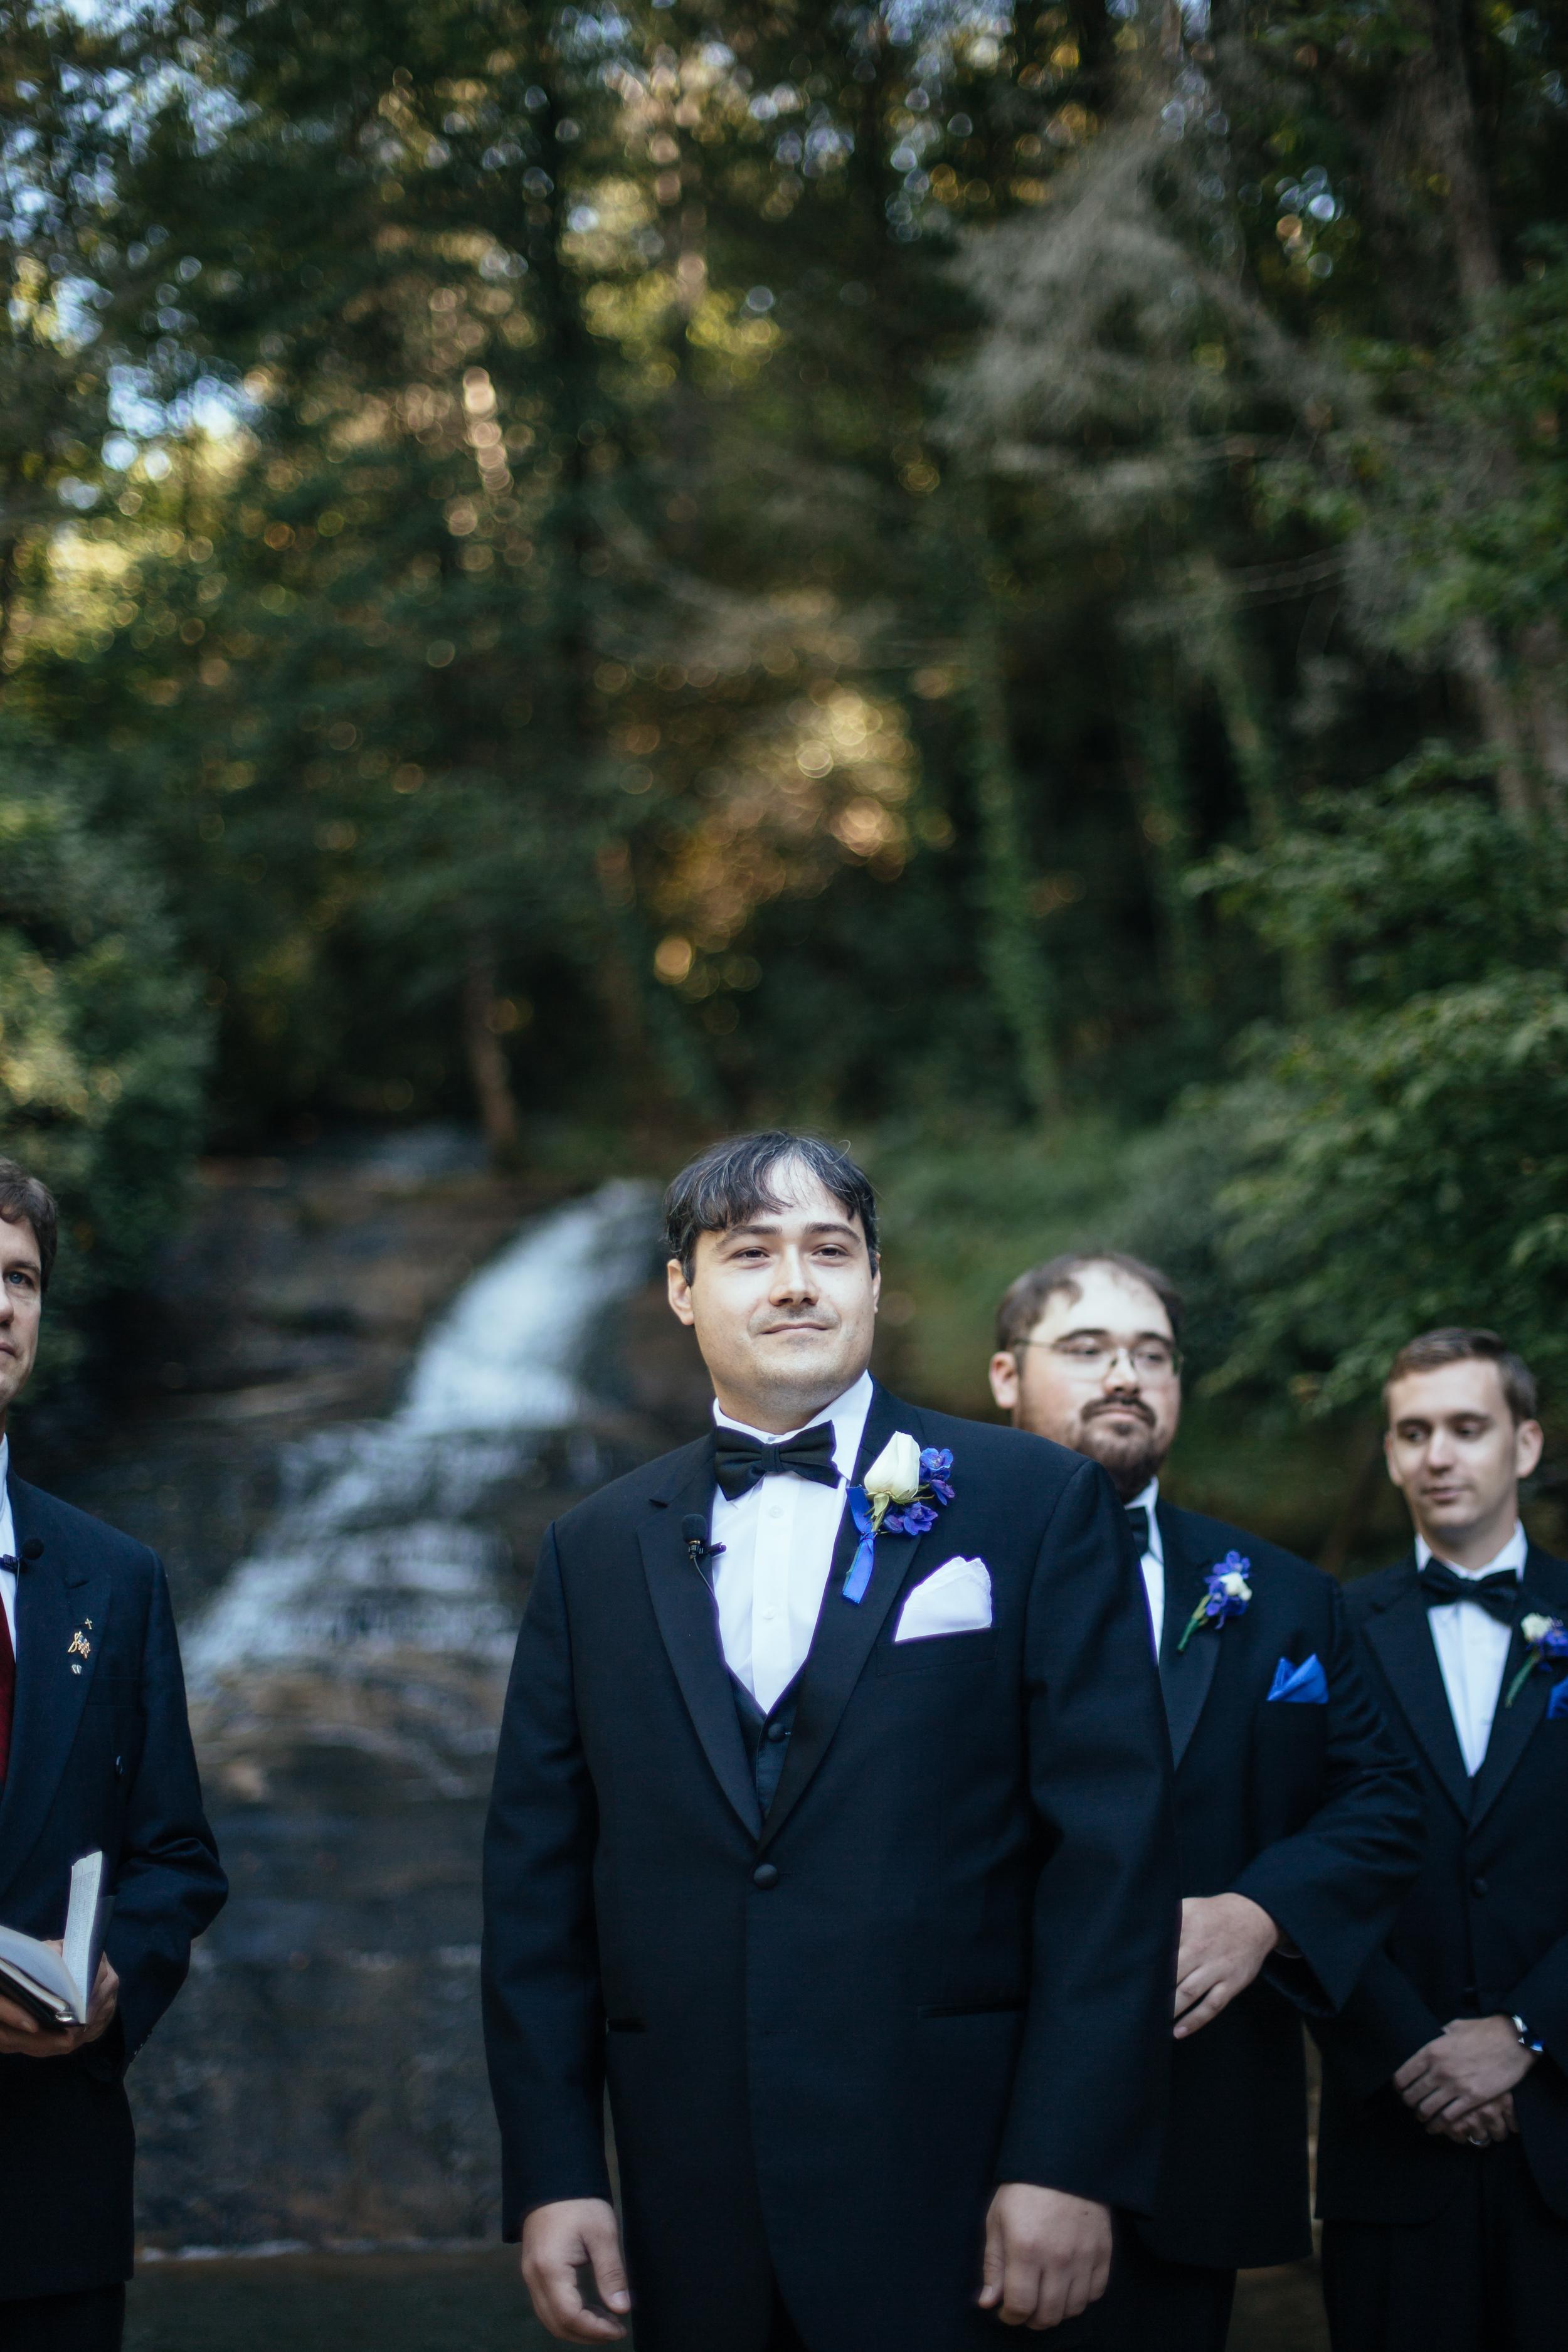 mitchell wedding blog-35.jpg